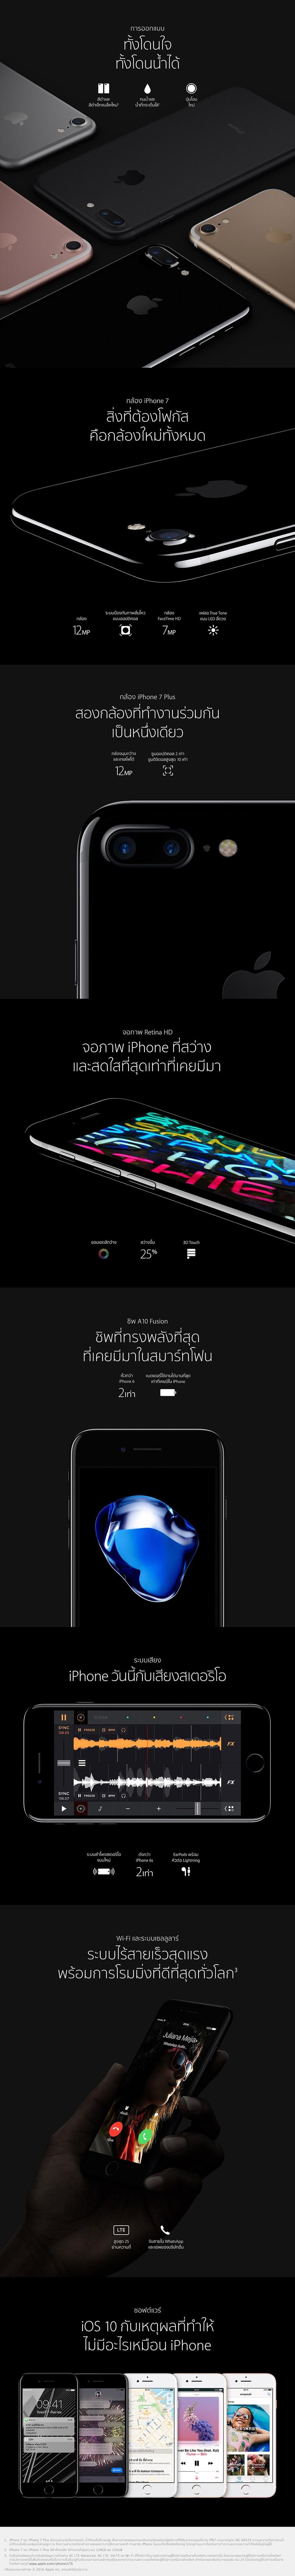 3-longpage-iphone7plus.jpg